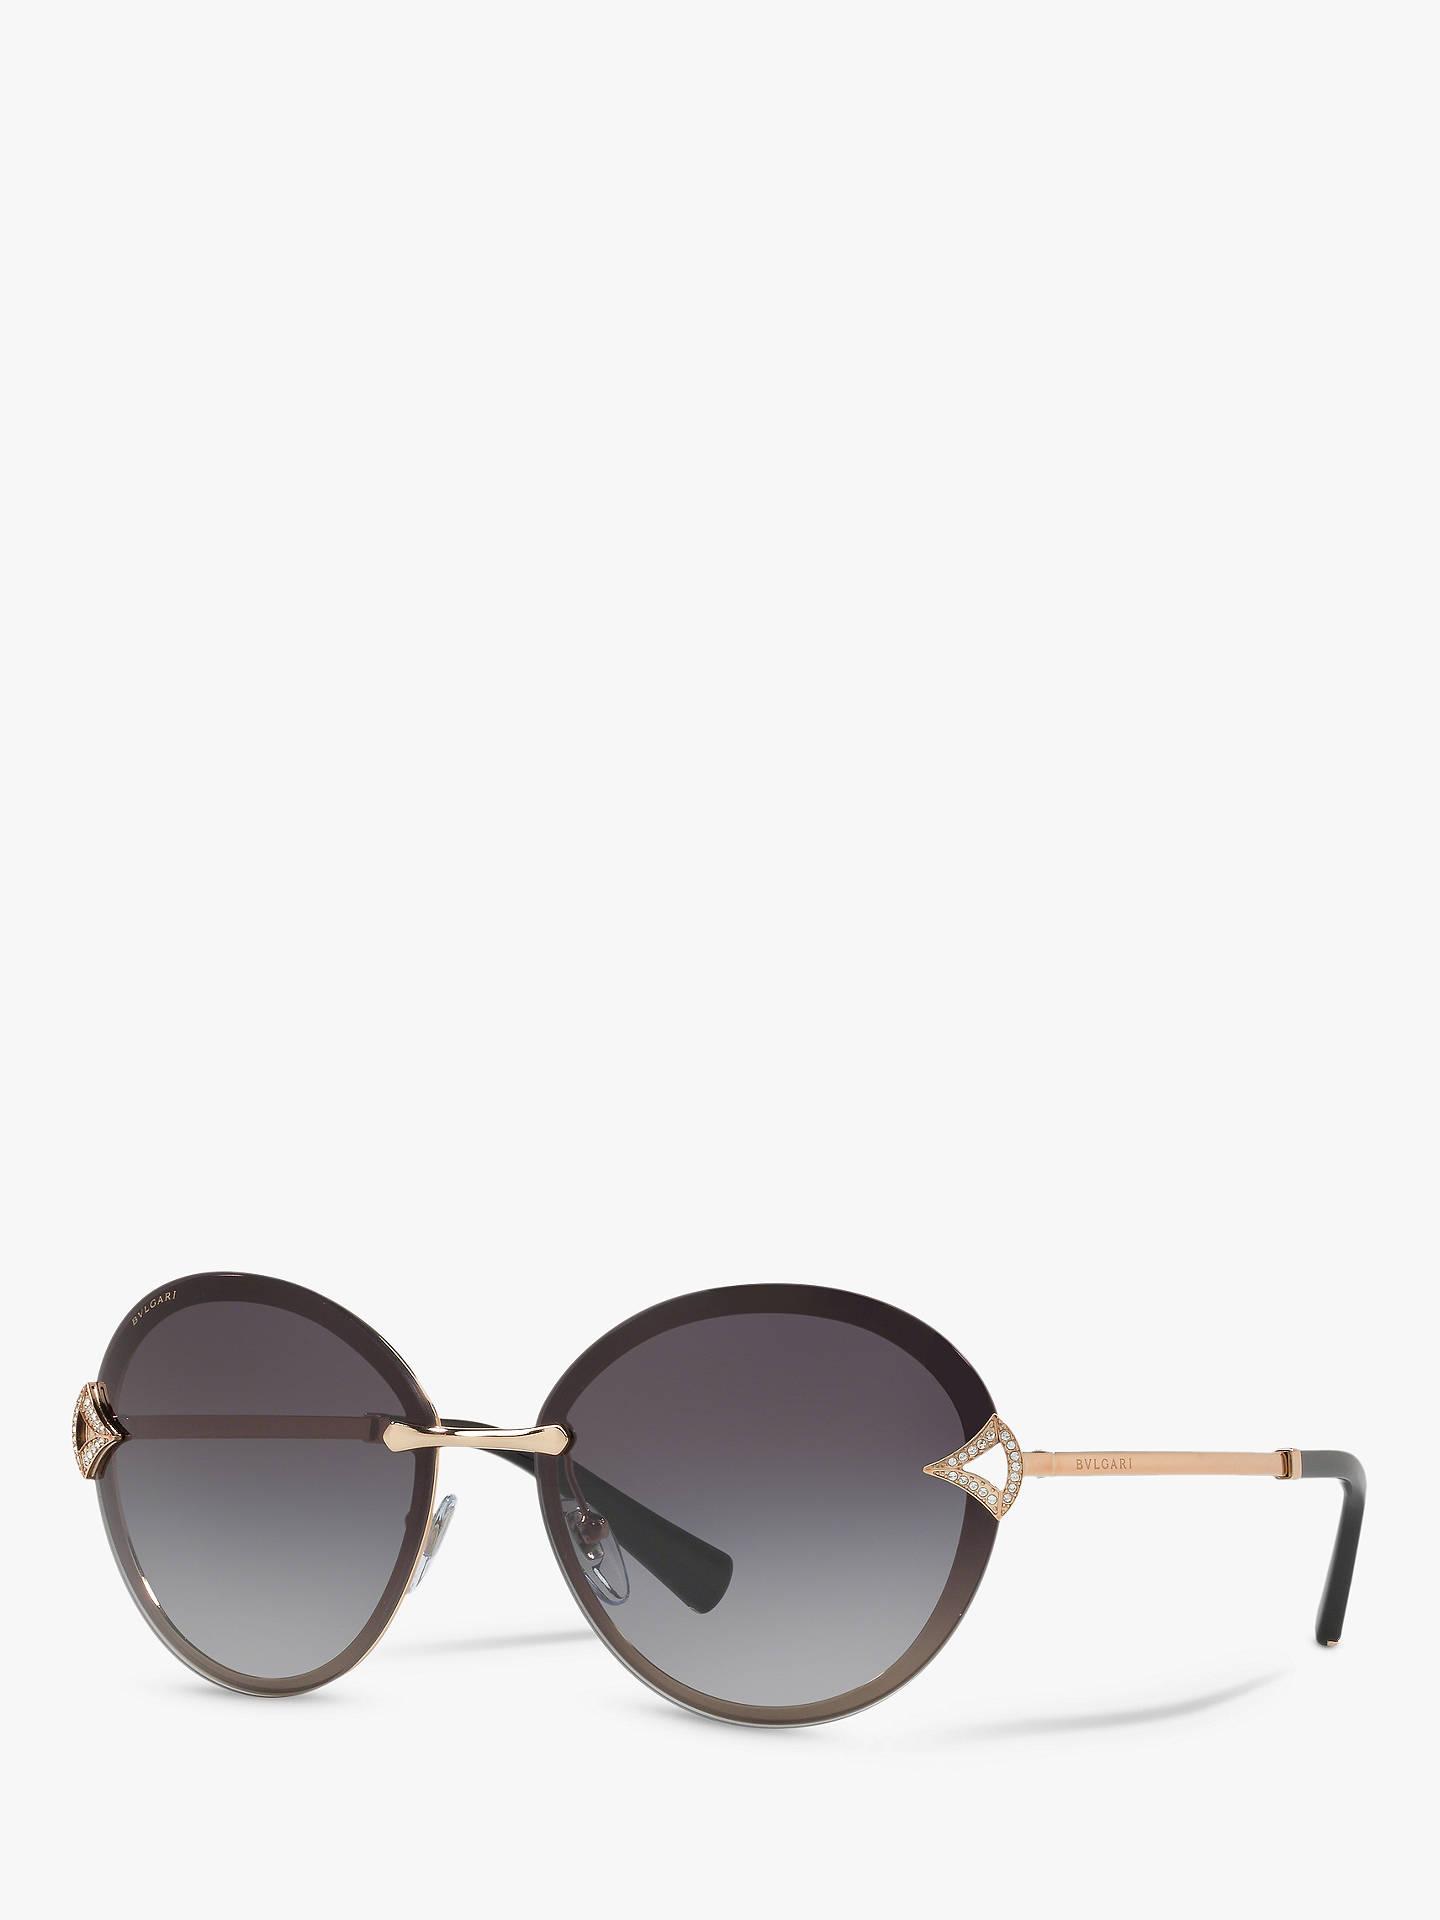 2043e78d95a Buy BVLGARI BV6101 Women s Embellished Round Sunglasses